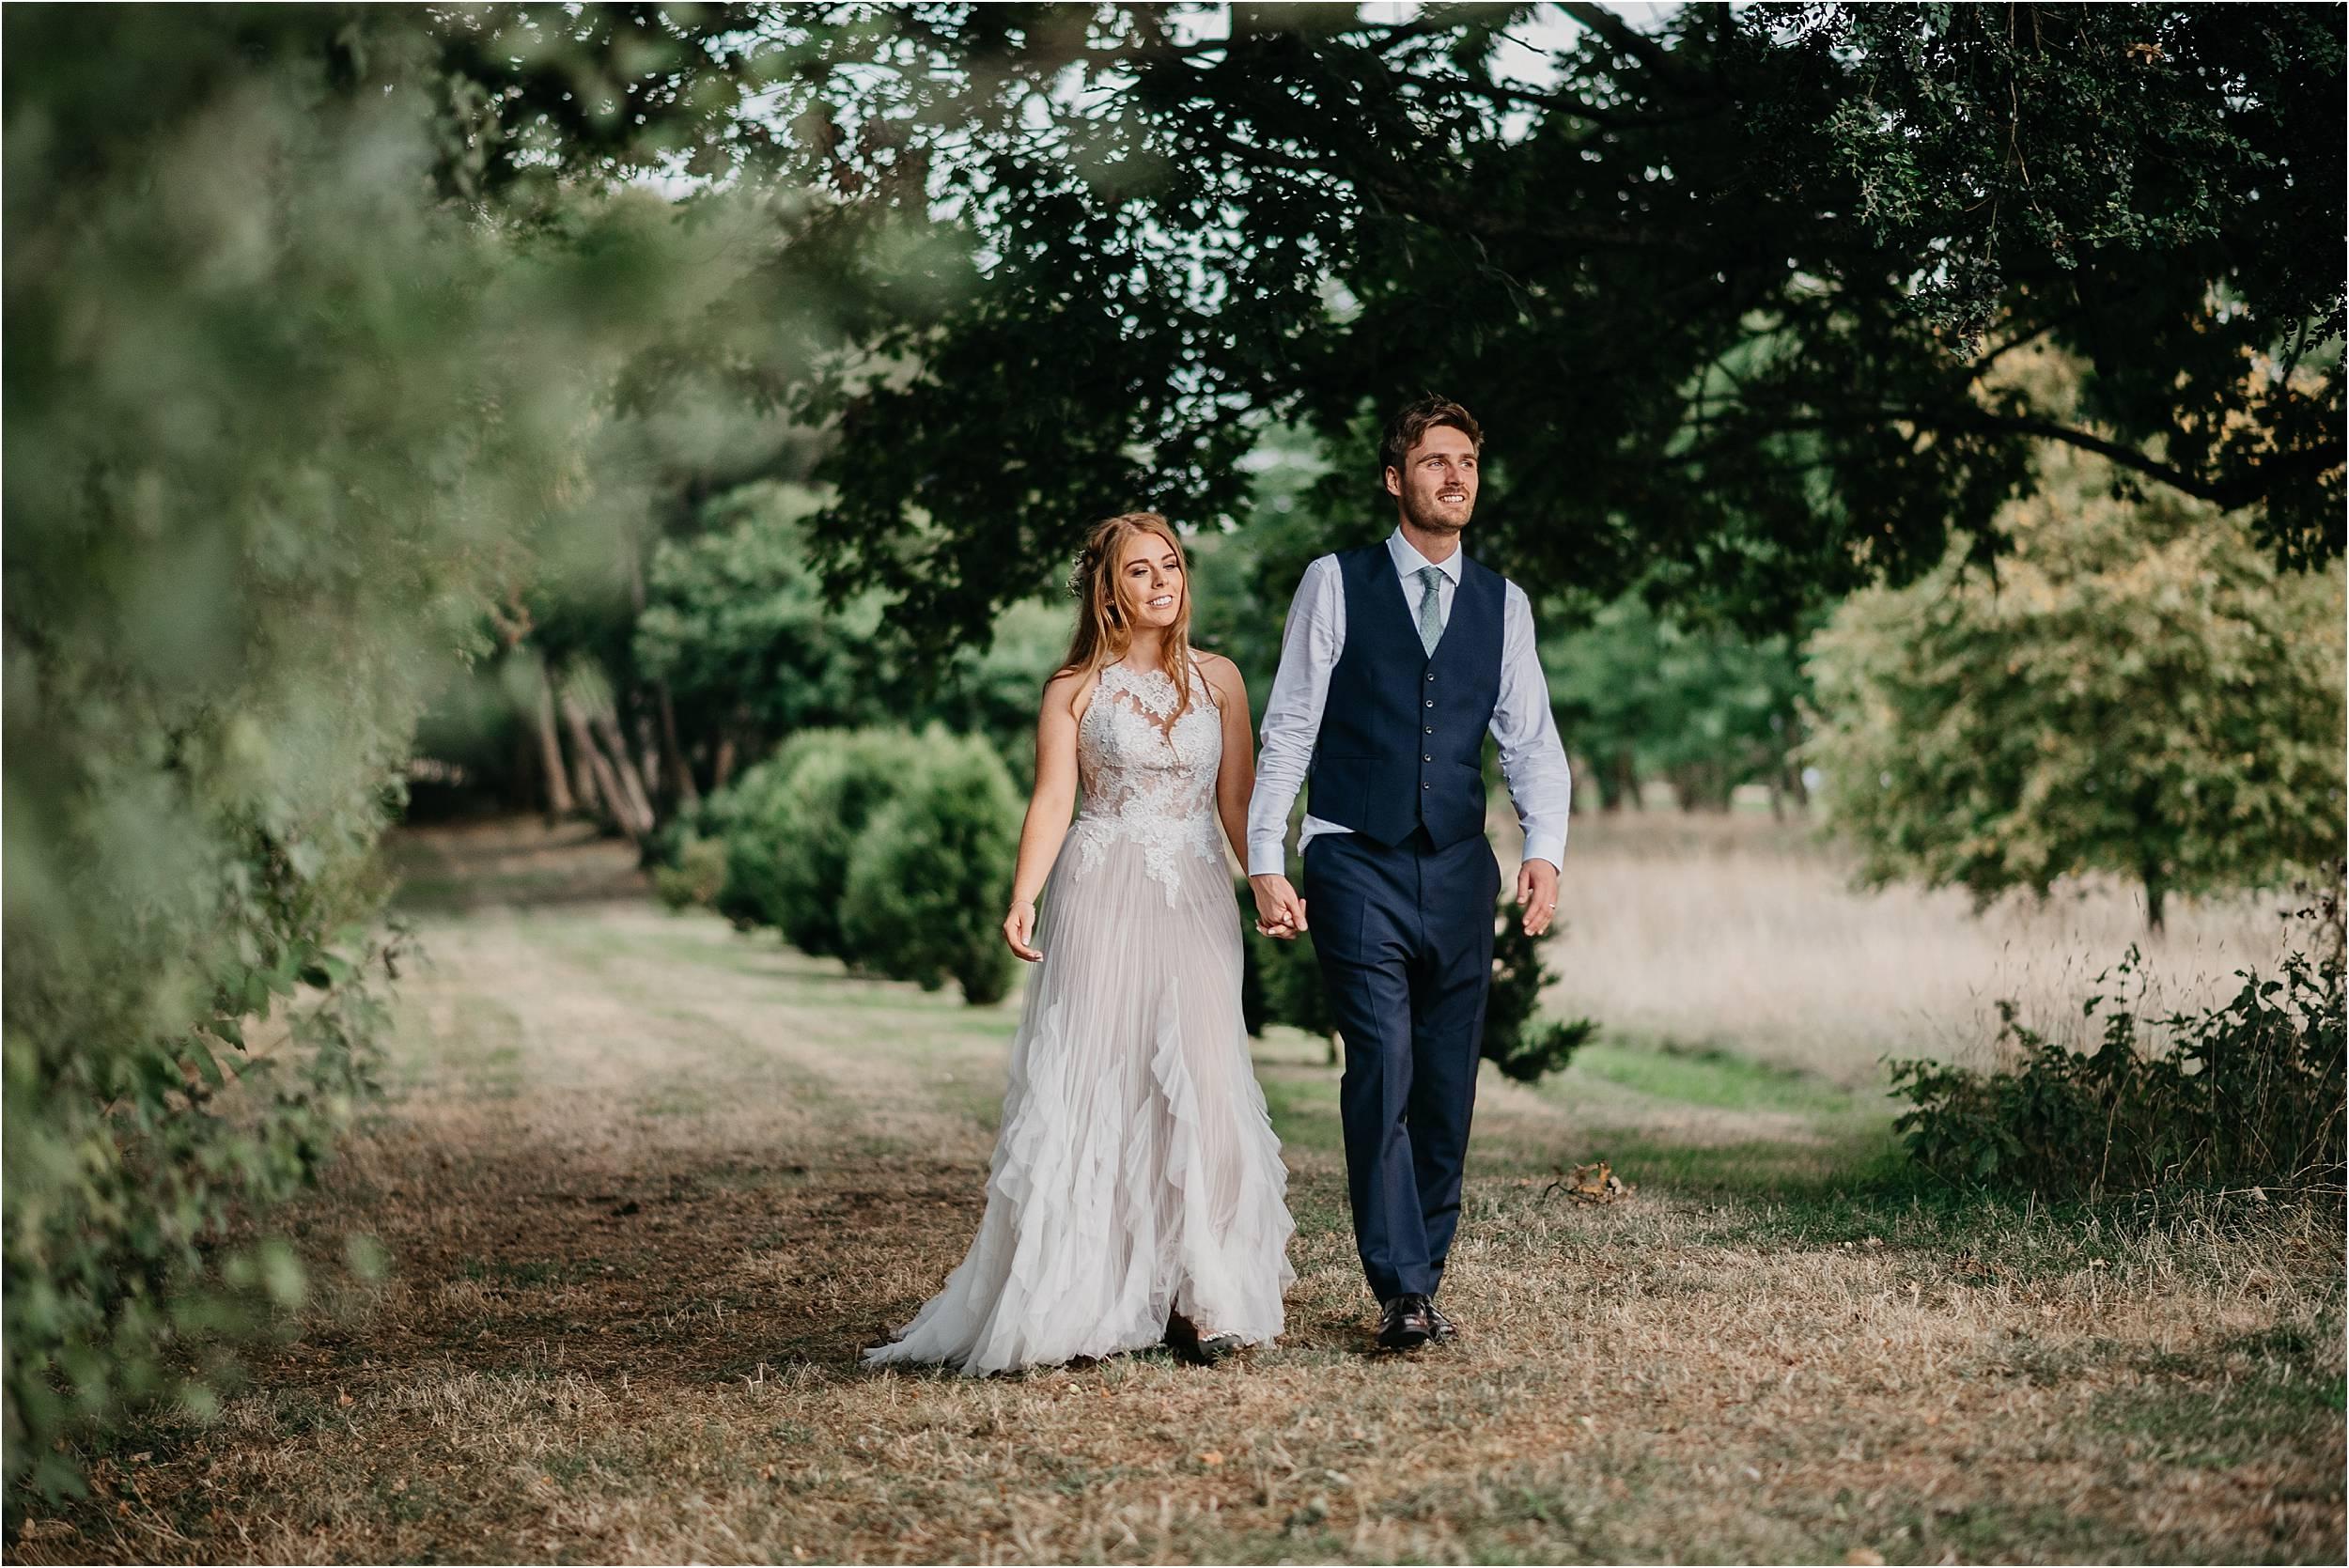 The Priory Little Wymondley Wedding Photography_0173.jpg